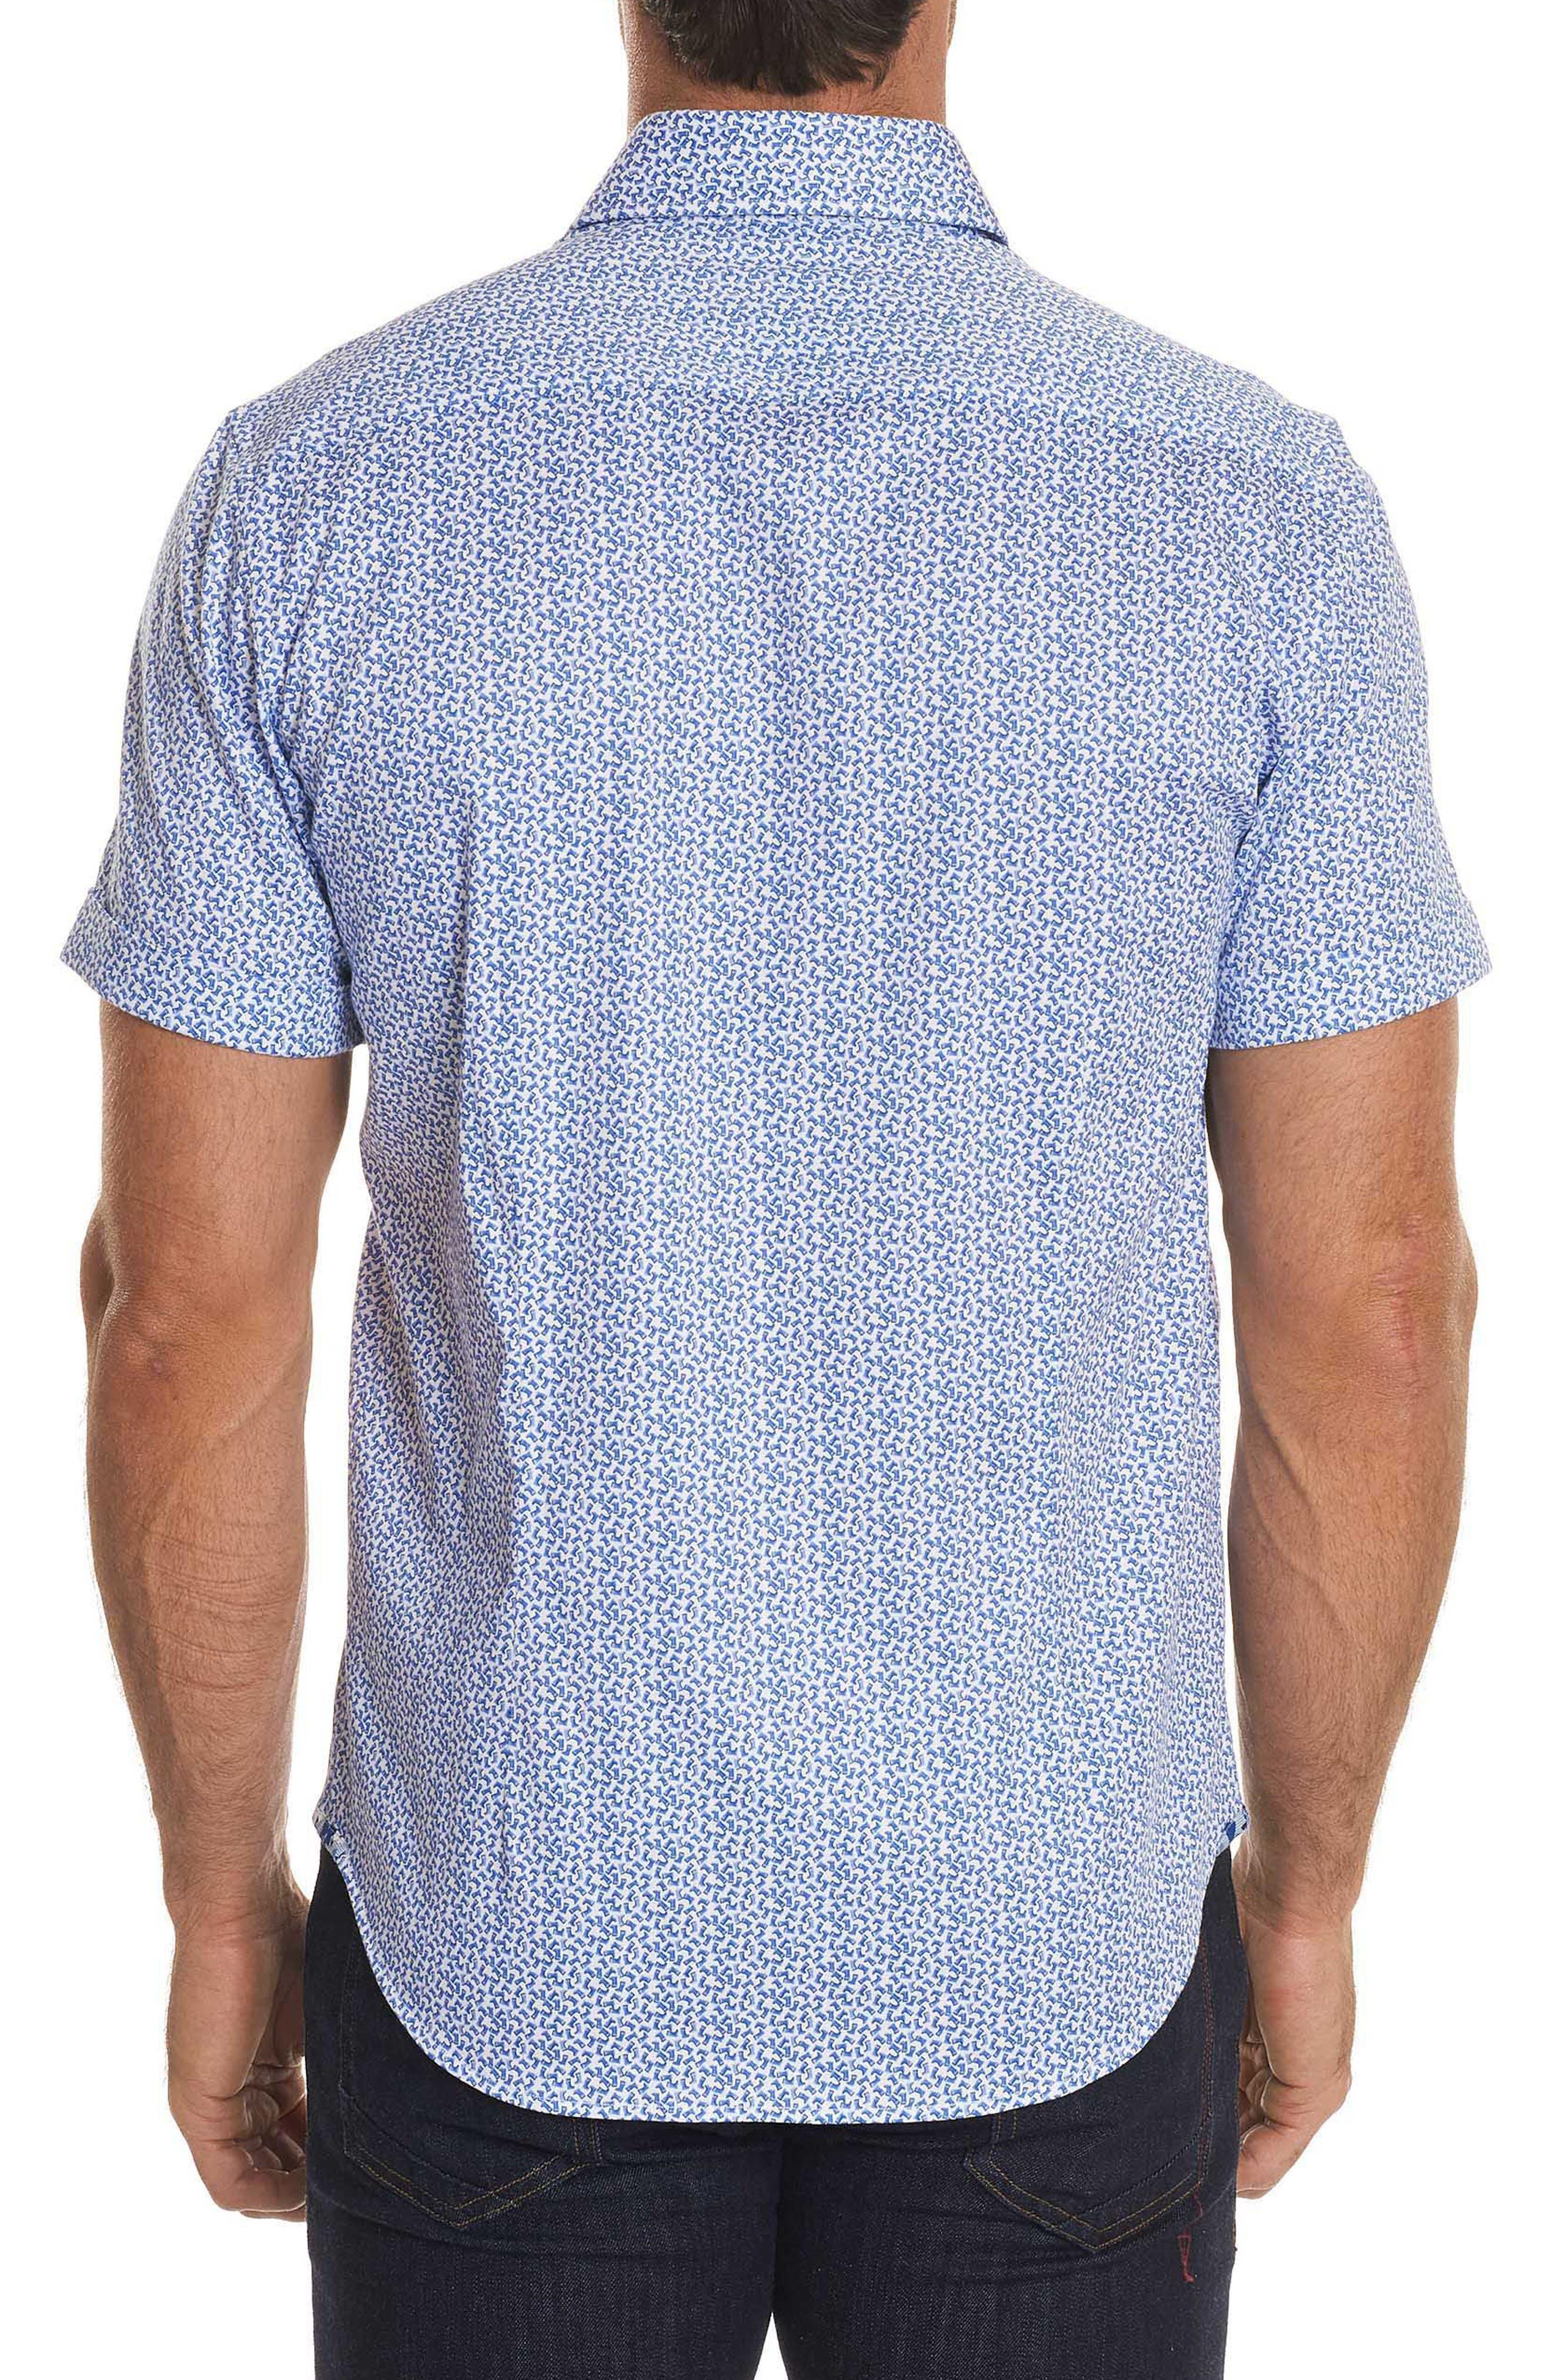 Hartman Tailored Fit Sport Shirt,                             Alternate thumbnail 2, color,                             400